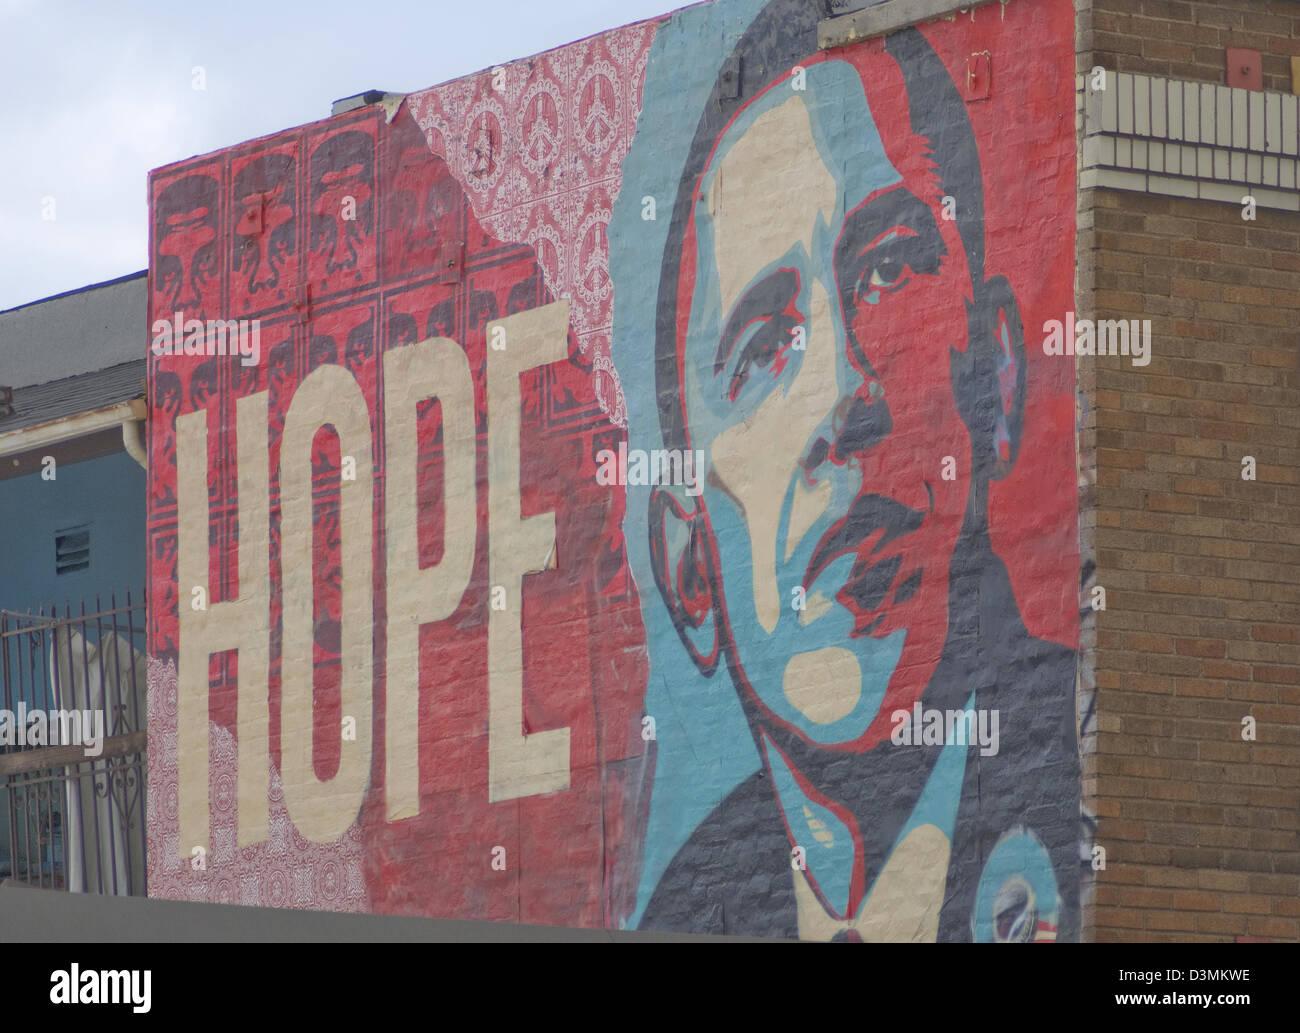 Shepard Fairey Barack Obama hoffen Wandbild am Hollywood Boulevard in Los Angeles Kalifornien Stockbild